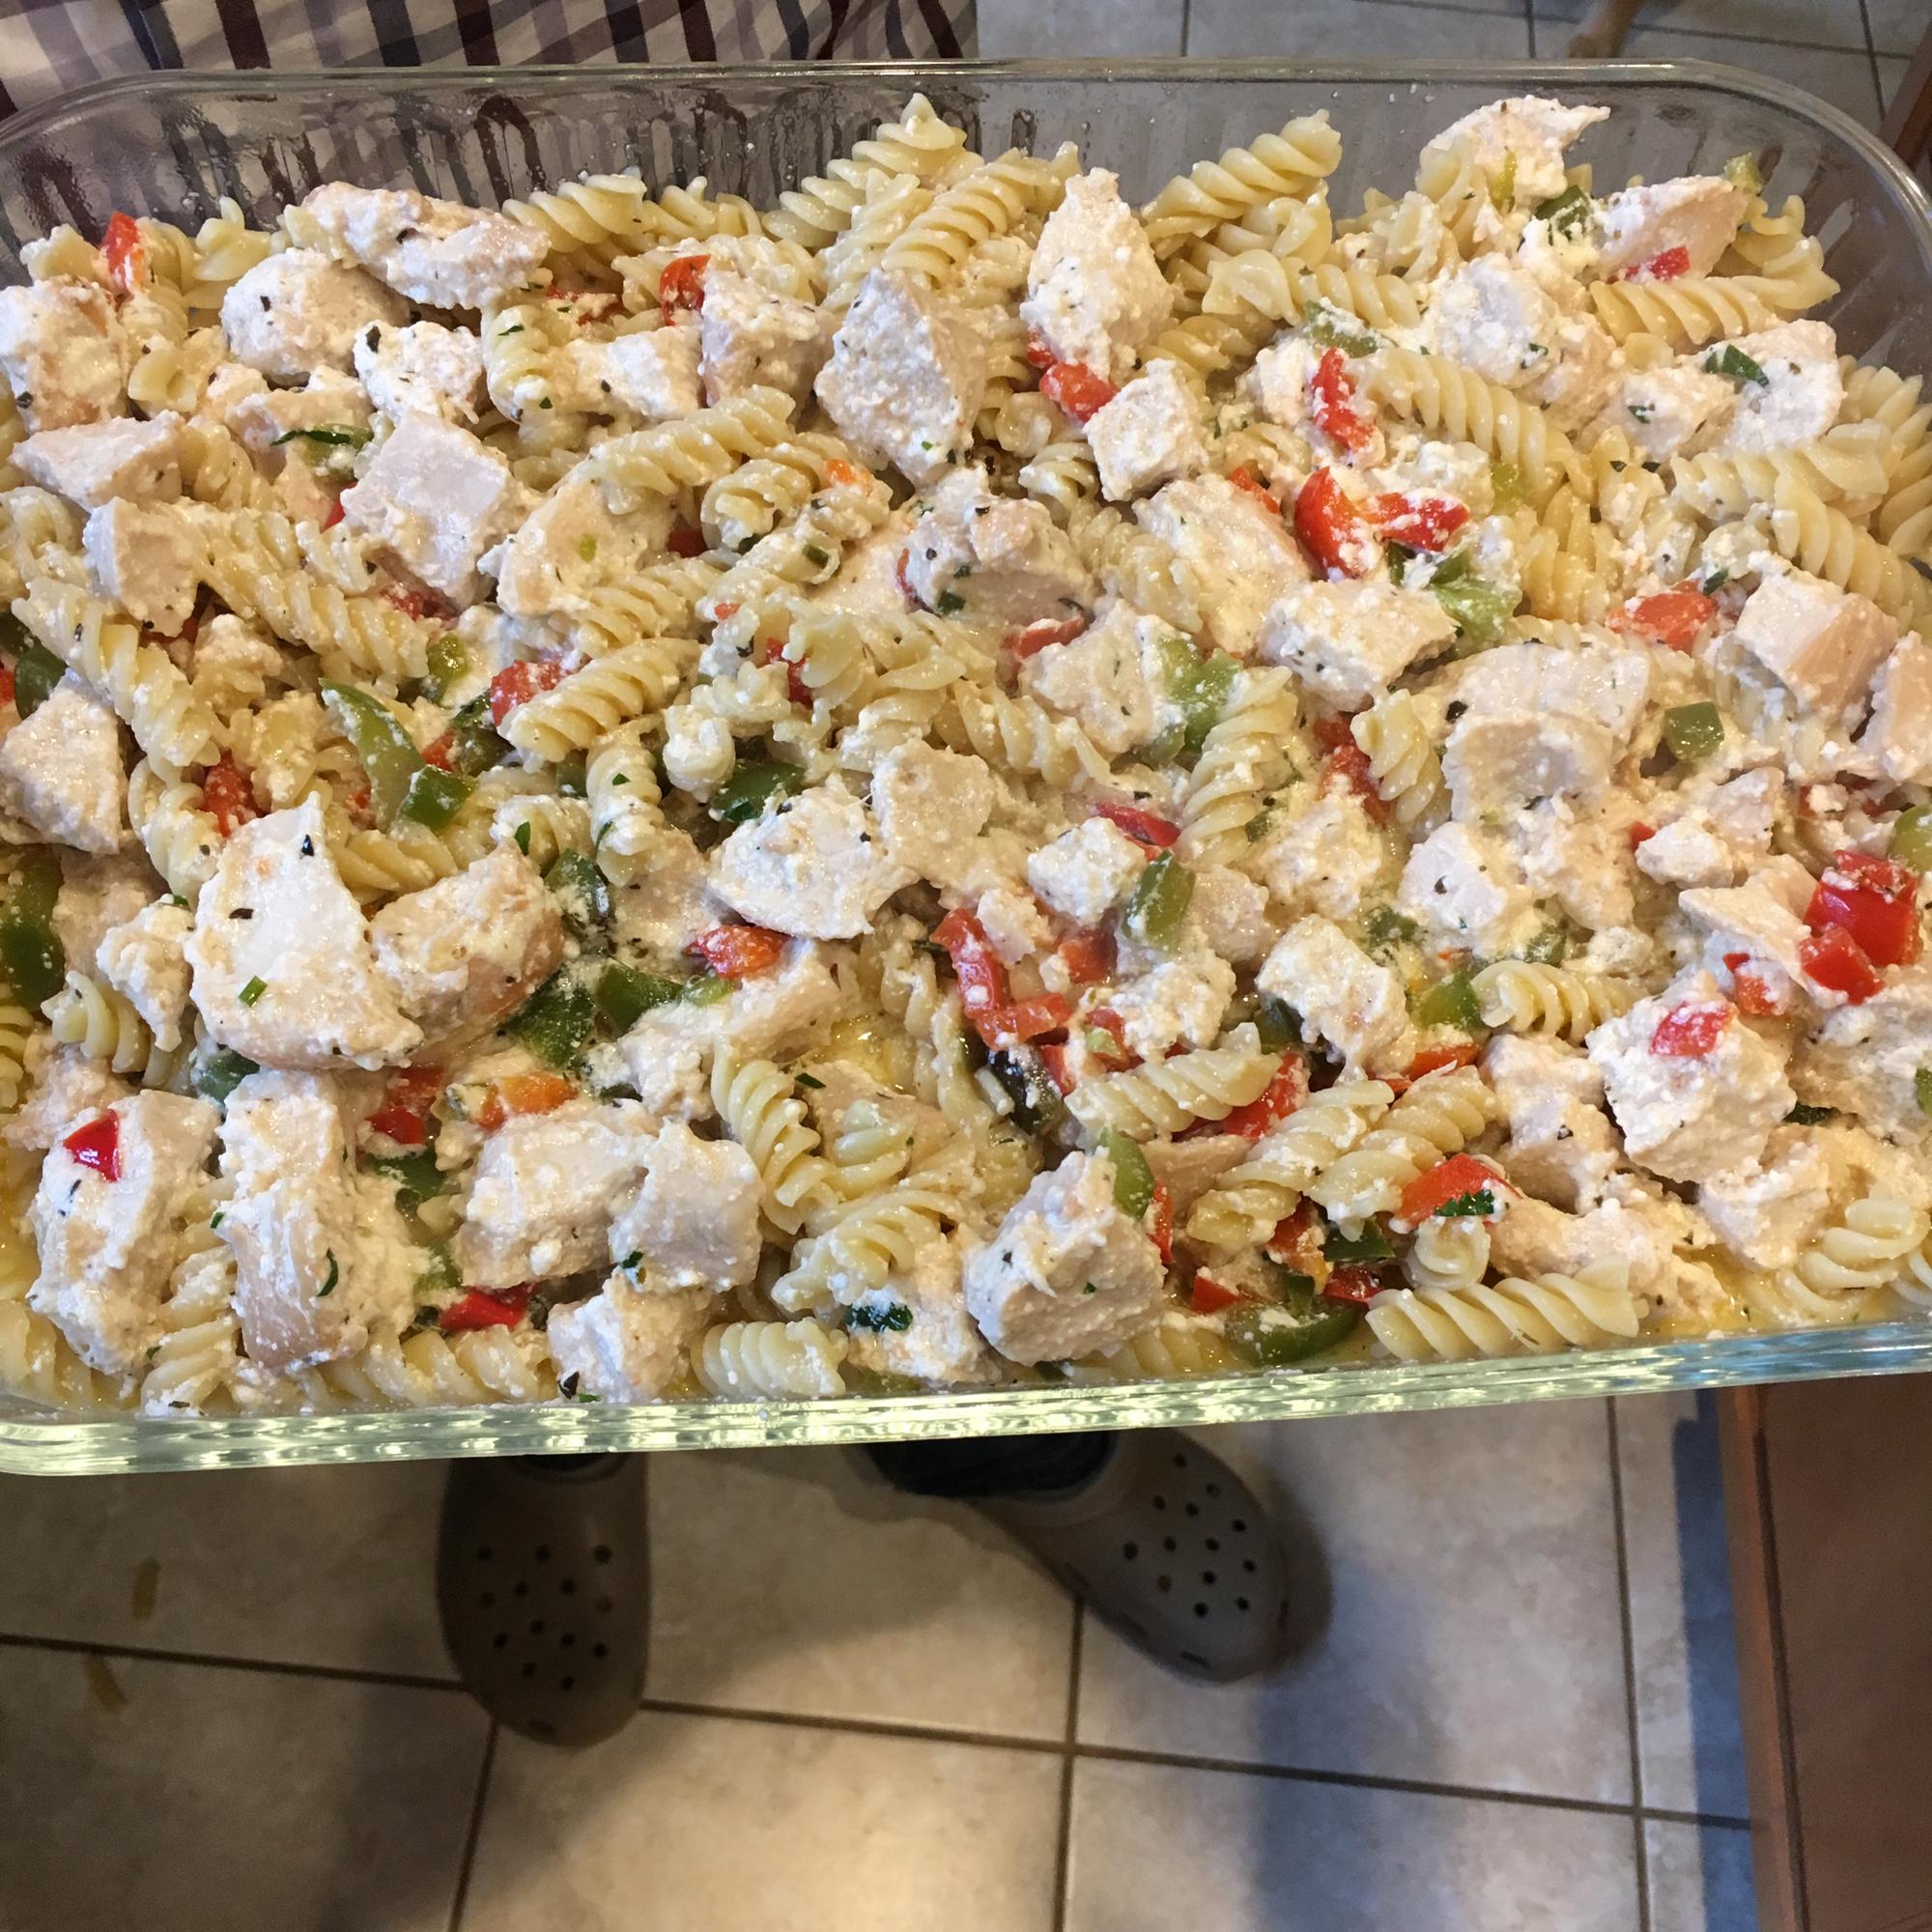 Chicken Rotini Stovetop Casserole amandaalphonse